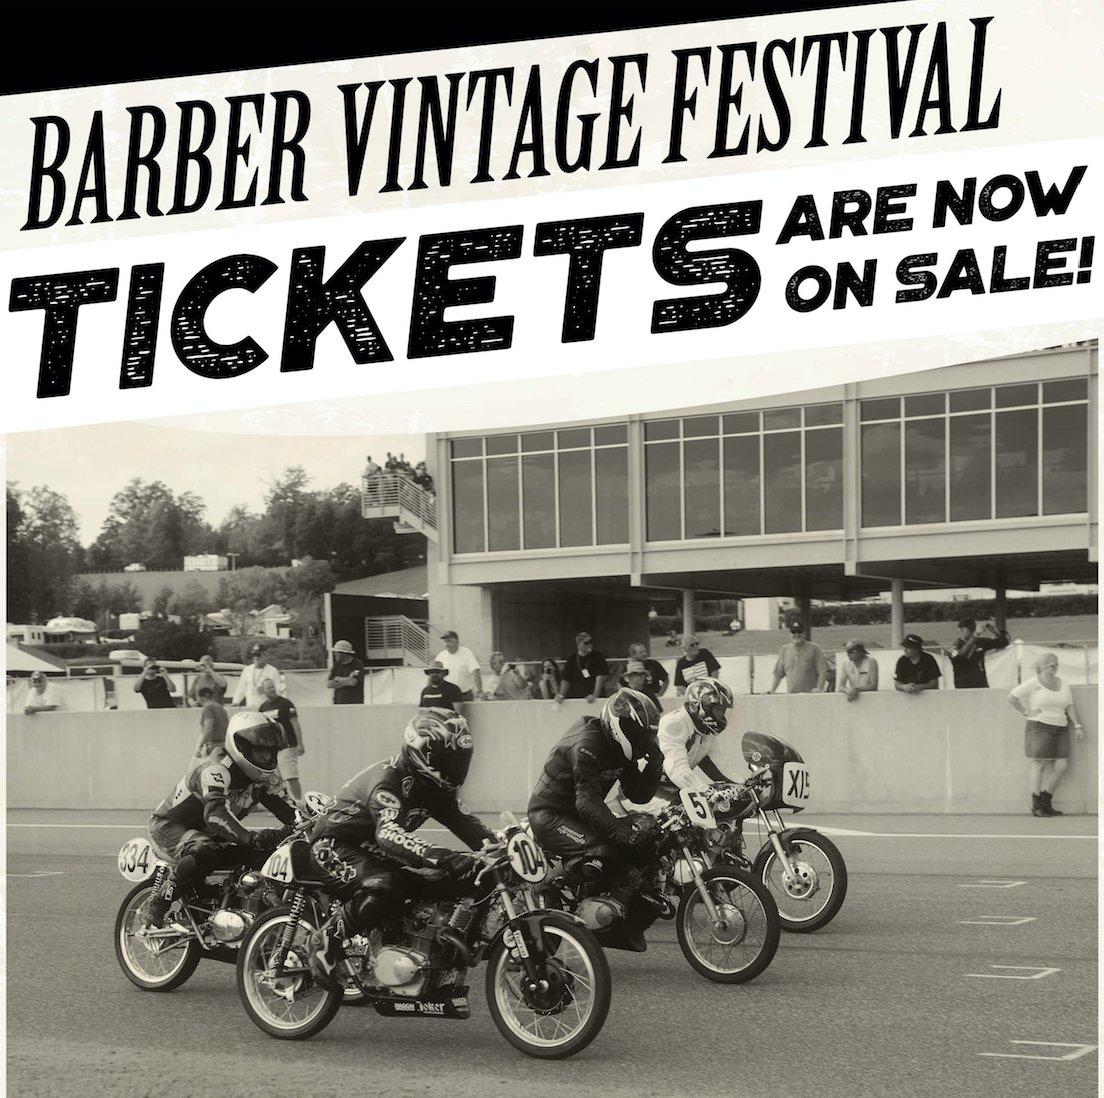 BarberMotorPark photo